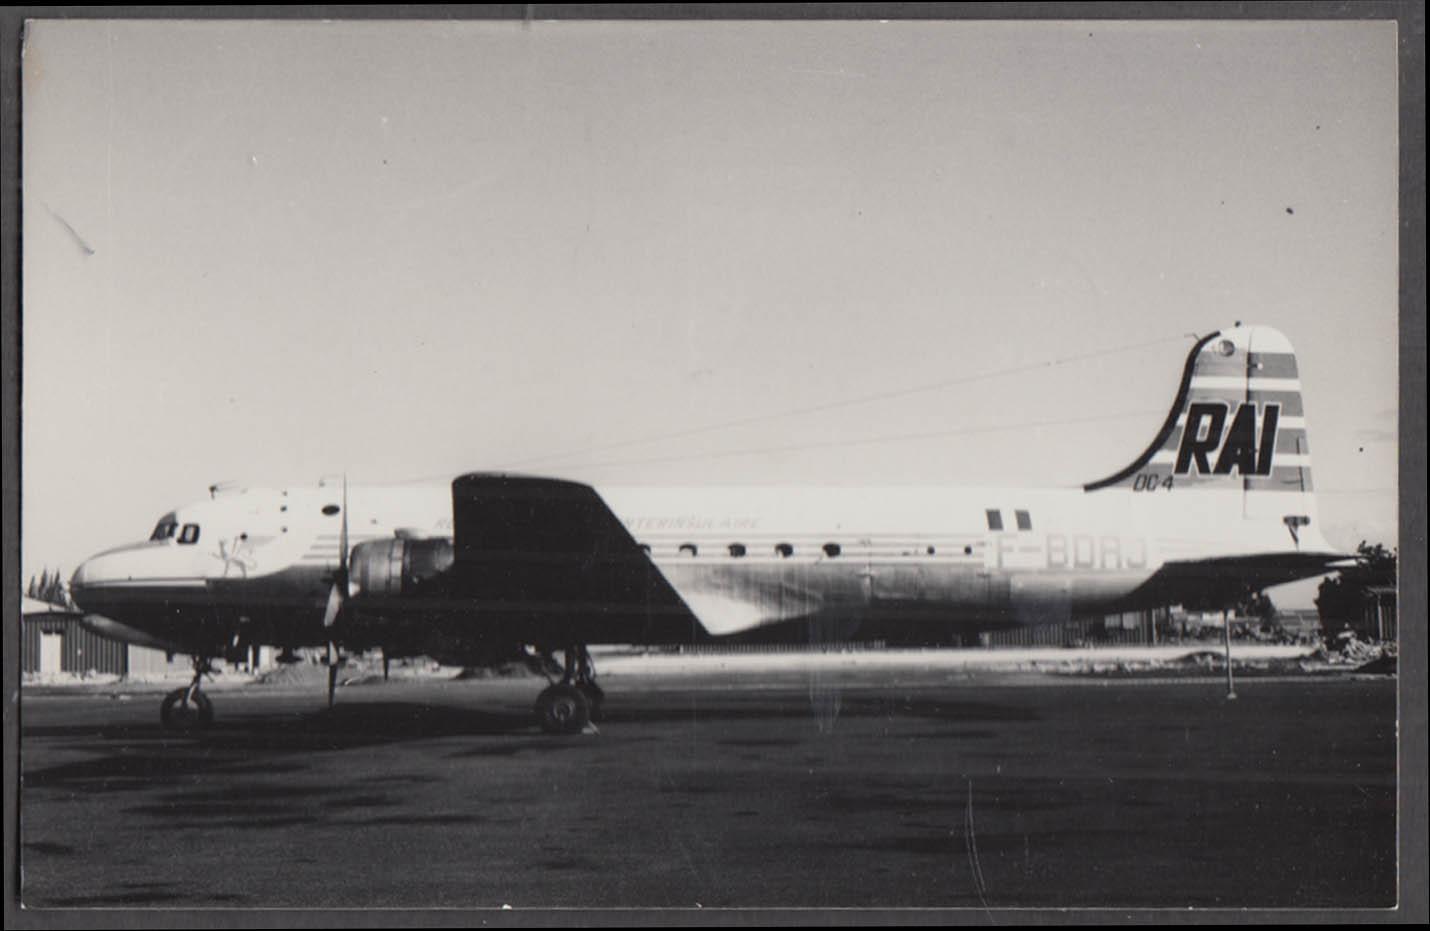 Image for RAI Airlines Douglas DC-4 F-BDRJ tarmac photo 1969